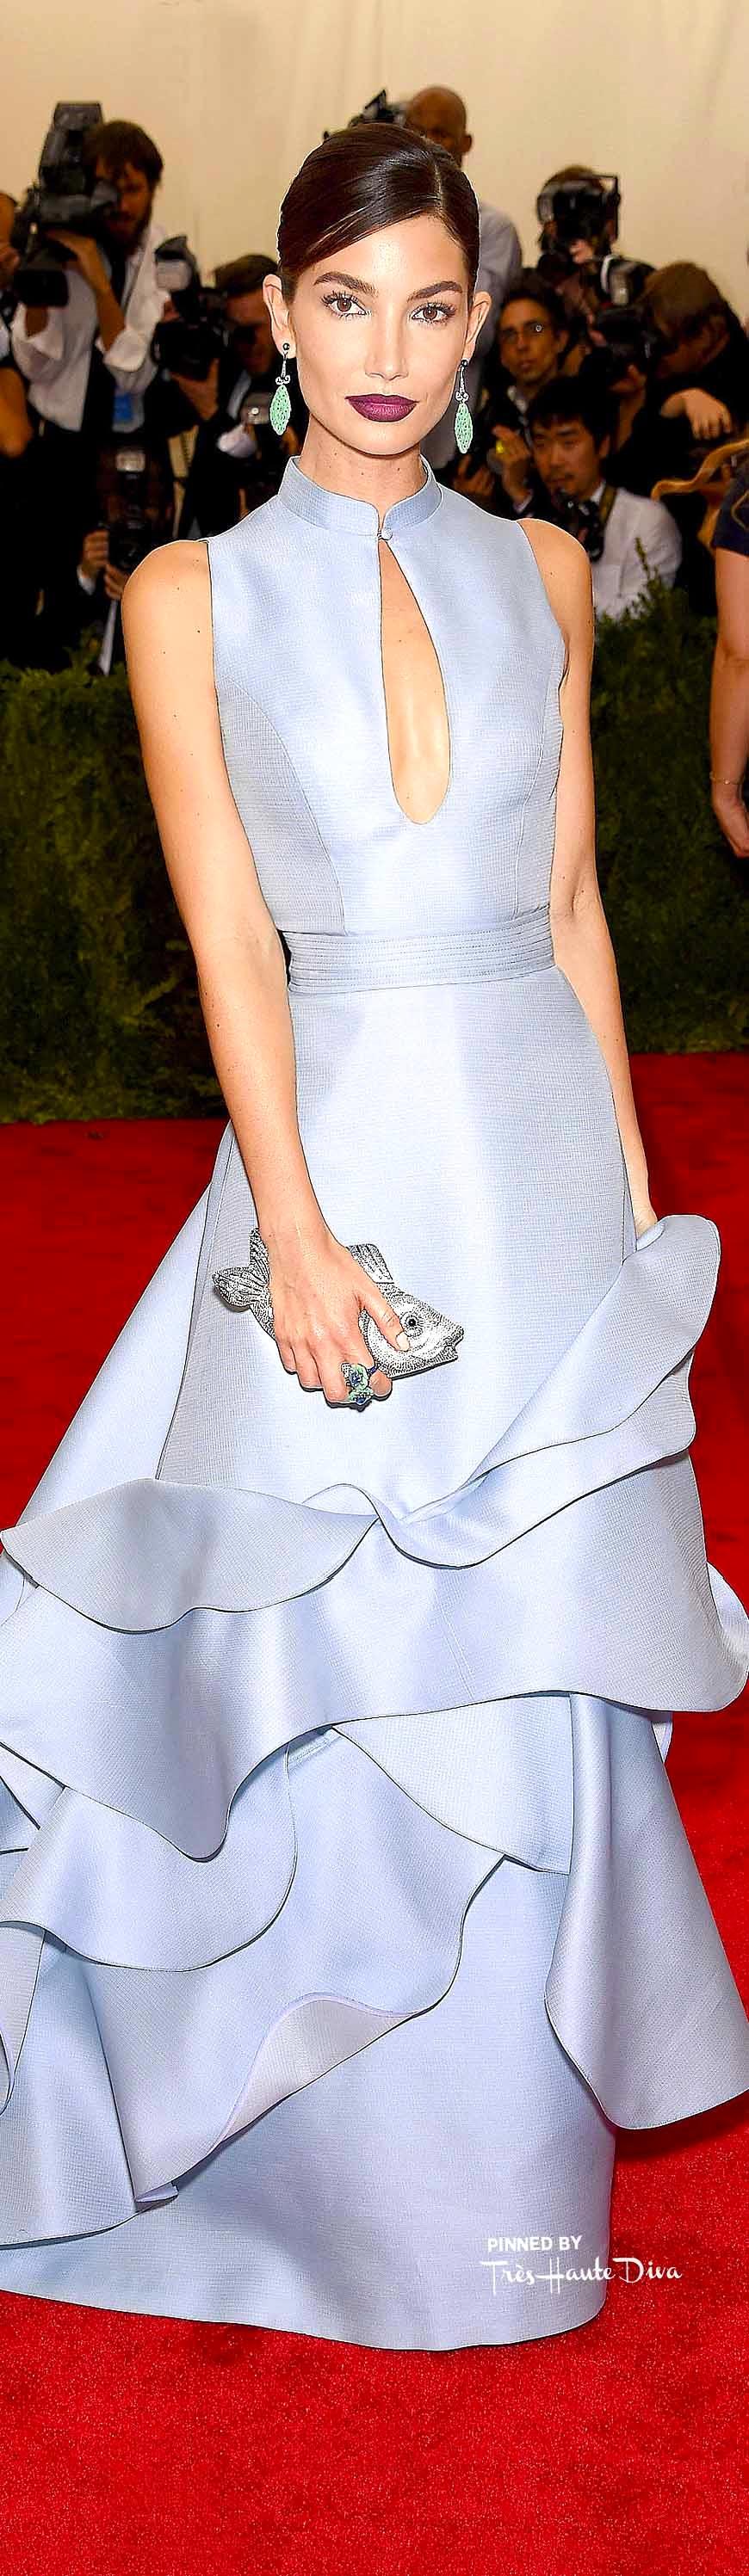 Lily Aldridge in Carolina Herrera Getty Images/ Dimitrios Kambouris